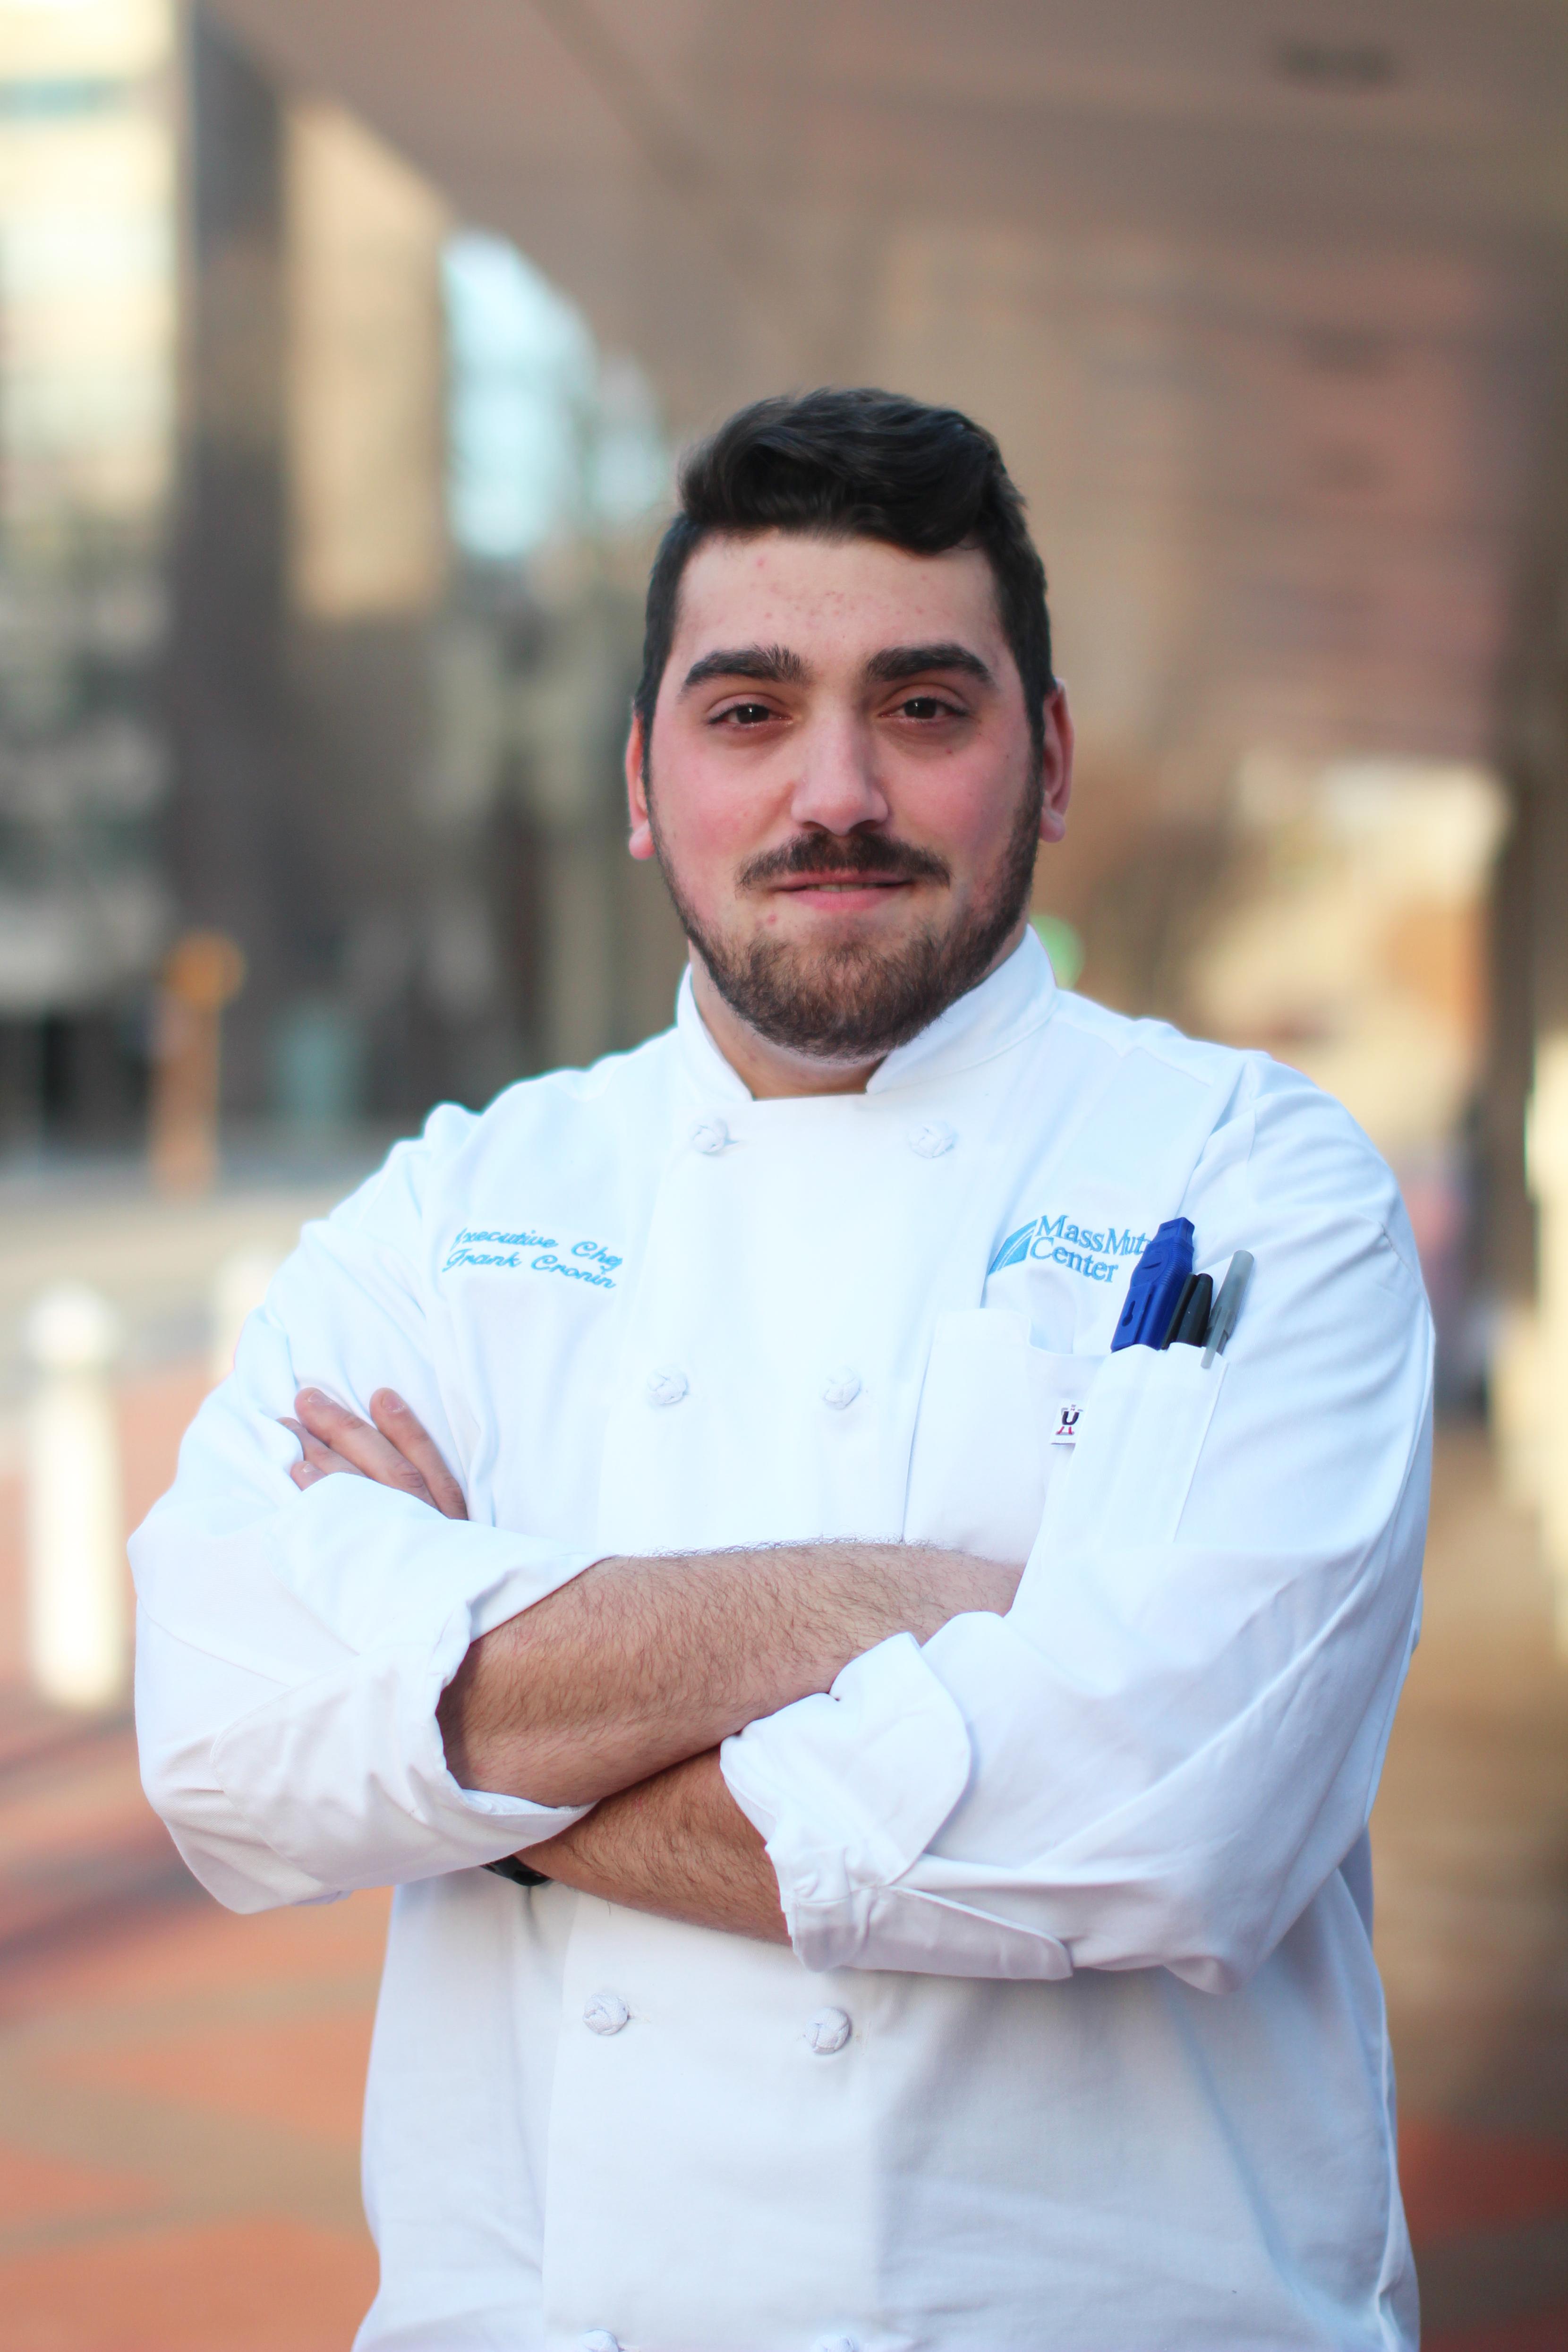 Exec Chef Frank Cronin Headshot.JPG